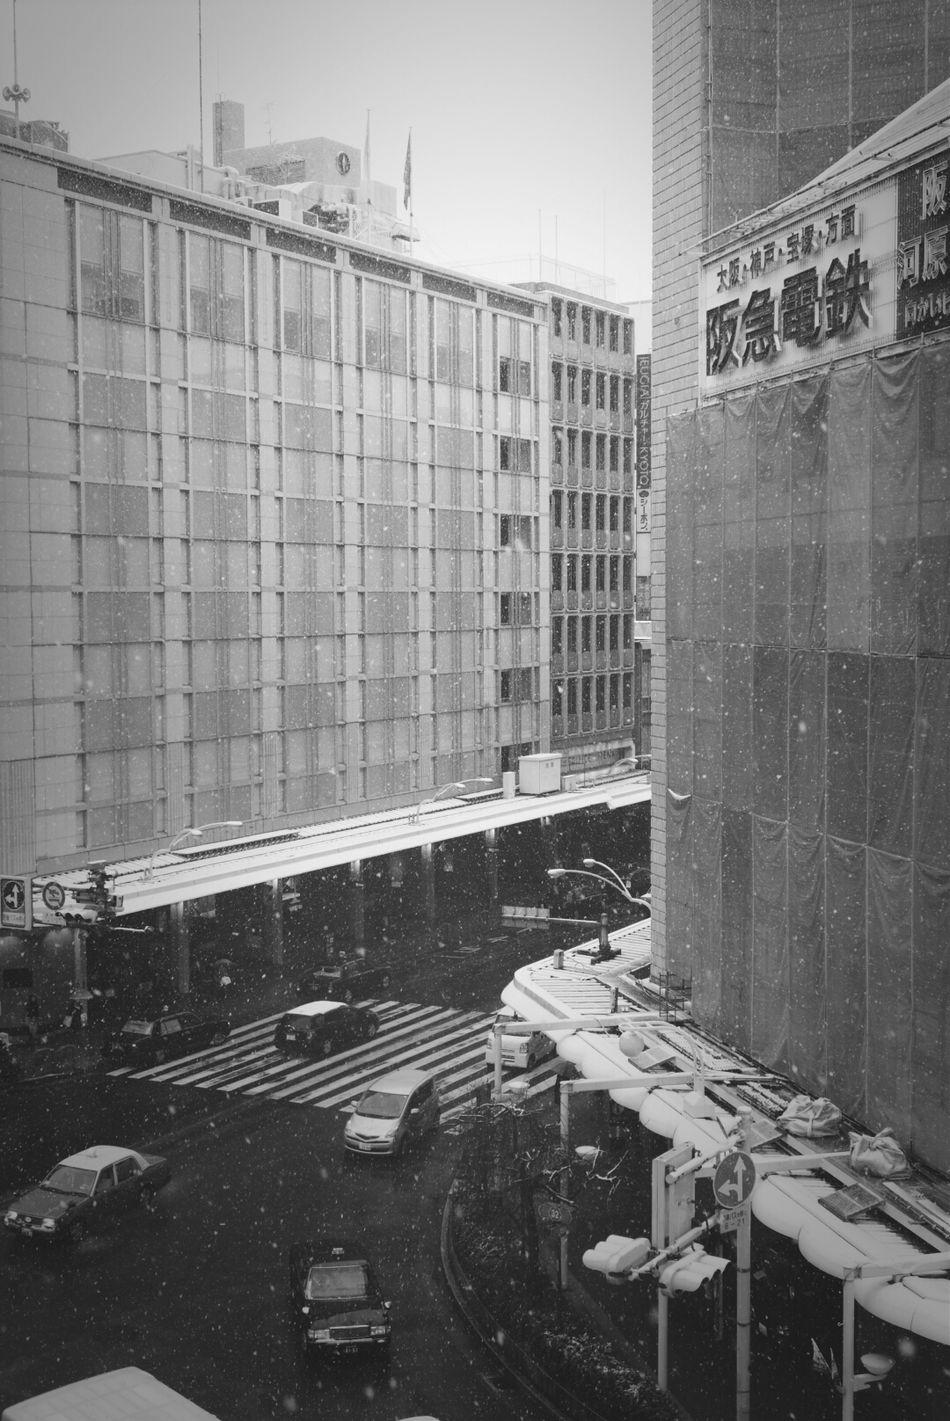 Snow Winter Street Photography Buildings